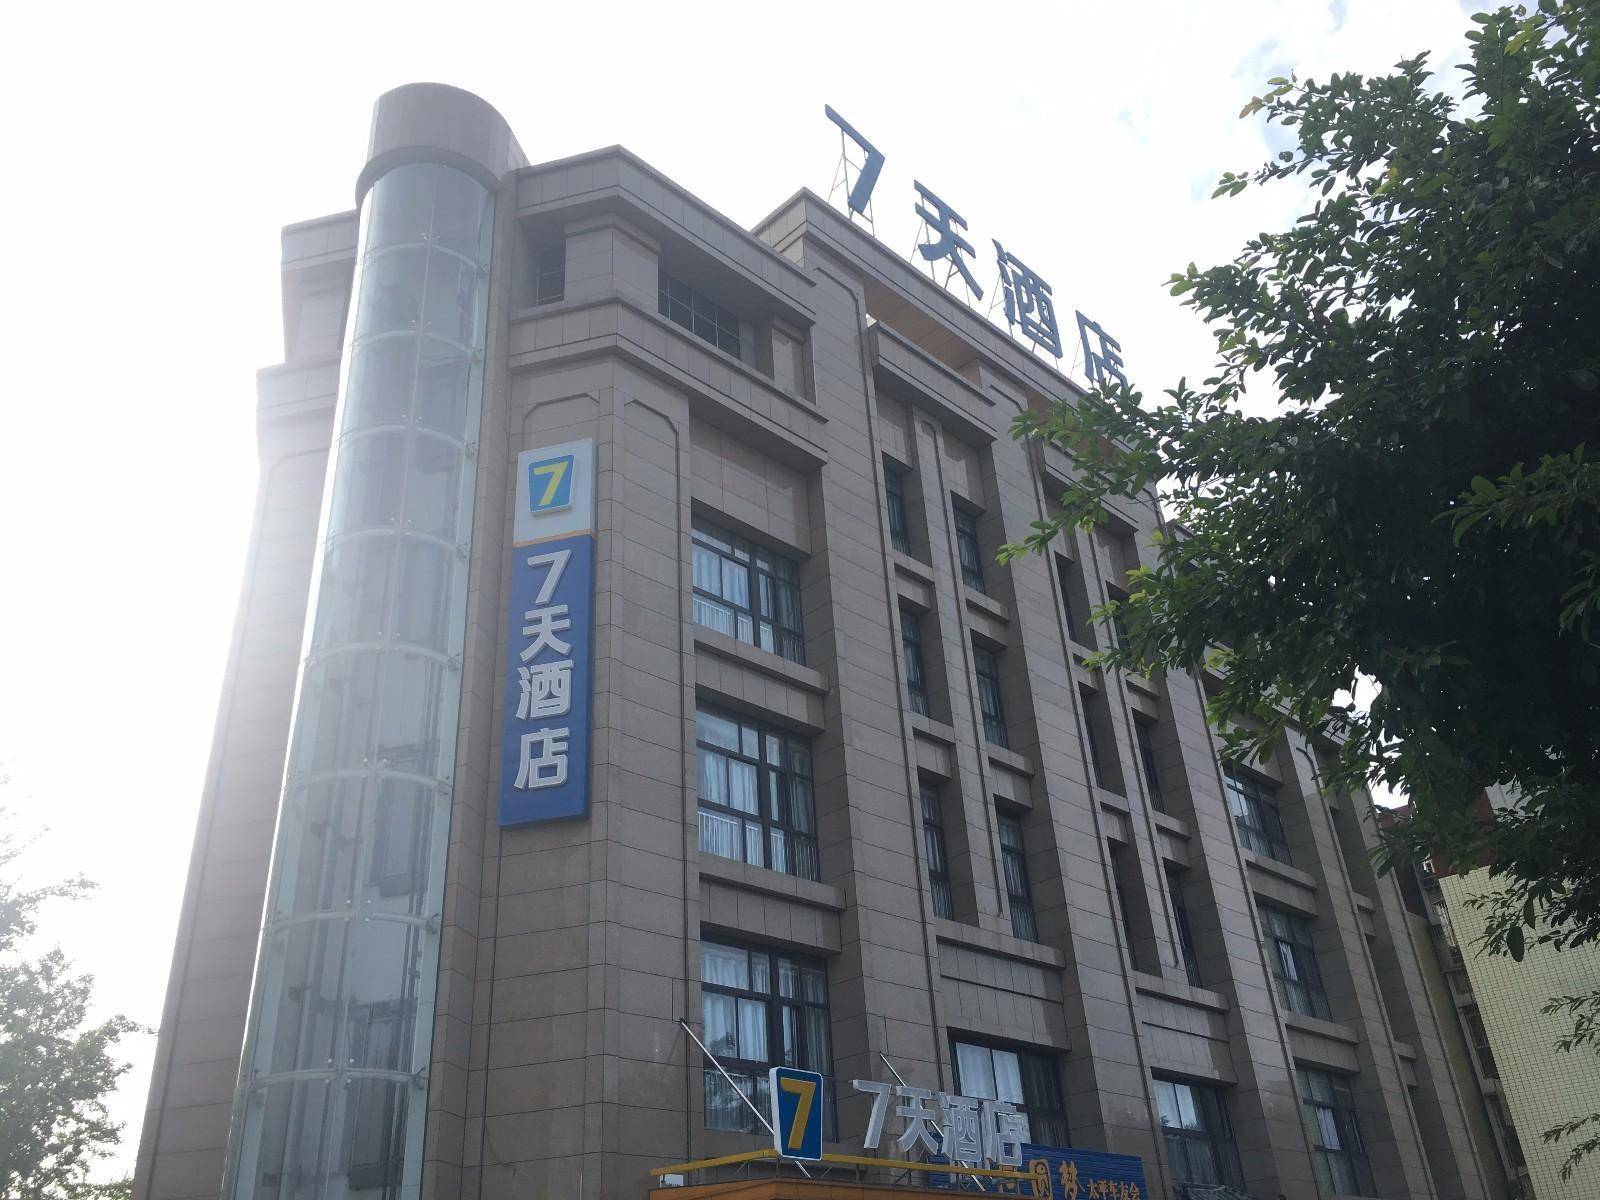 7 Days Inn·Santai Zizhou Main Road, Mianyang